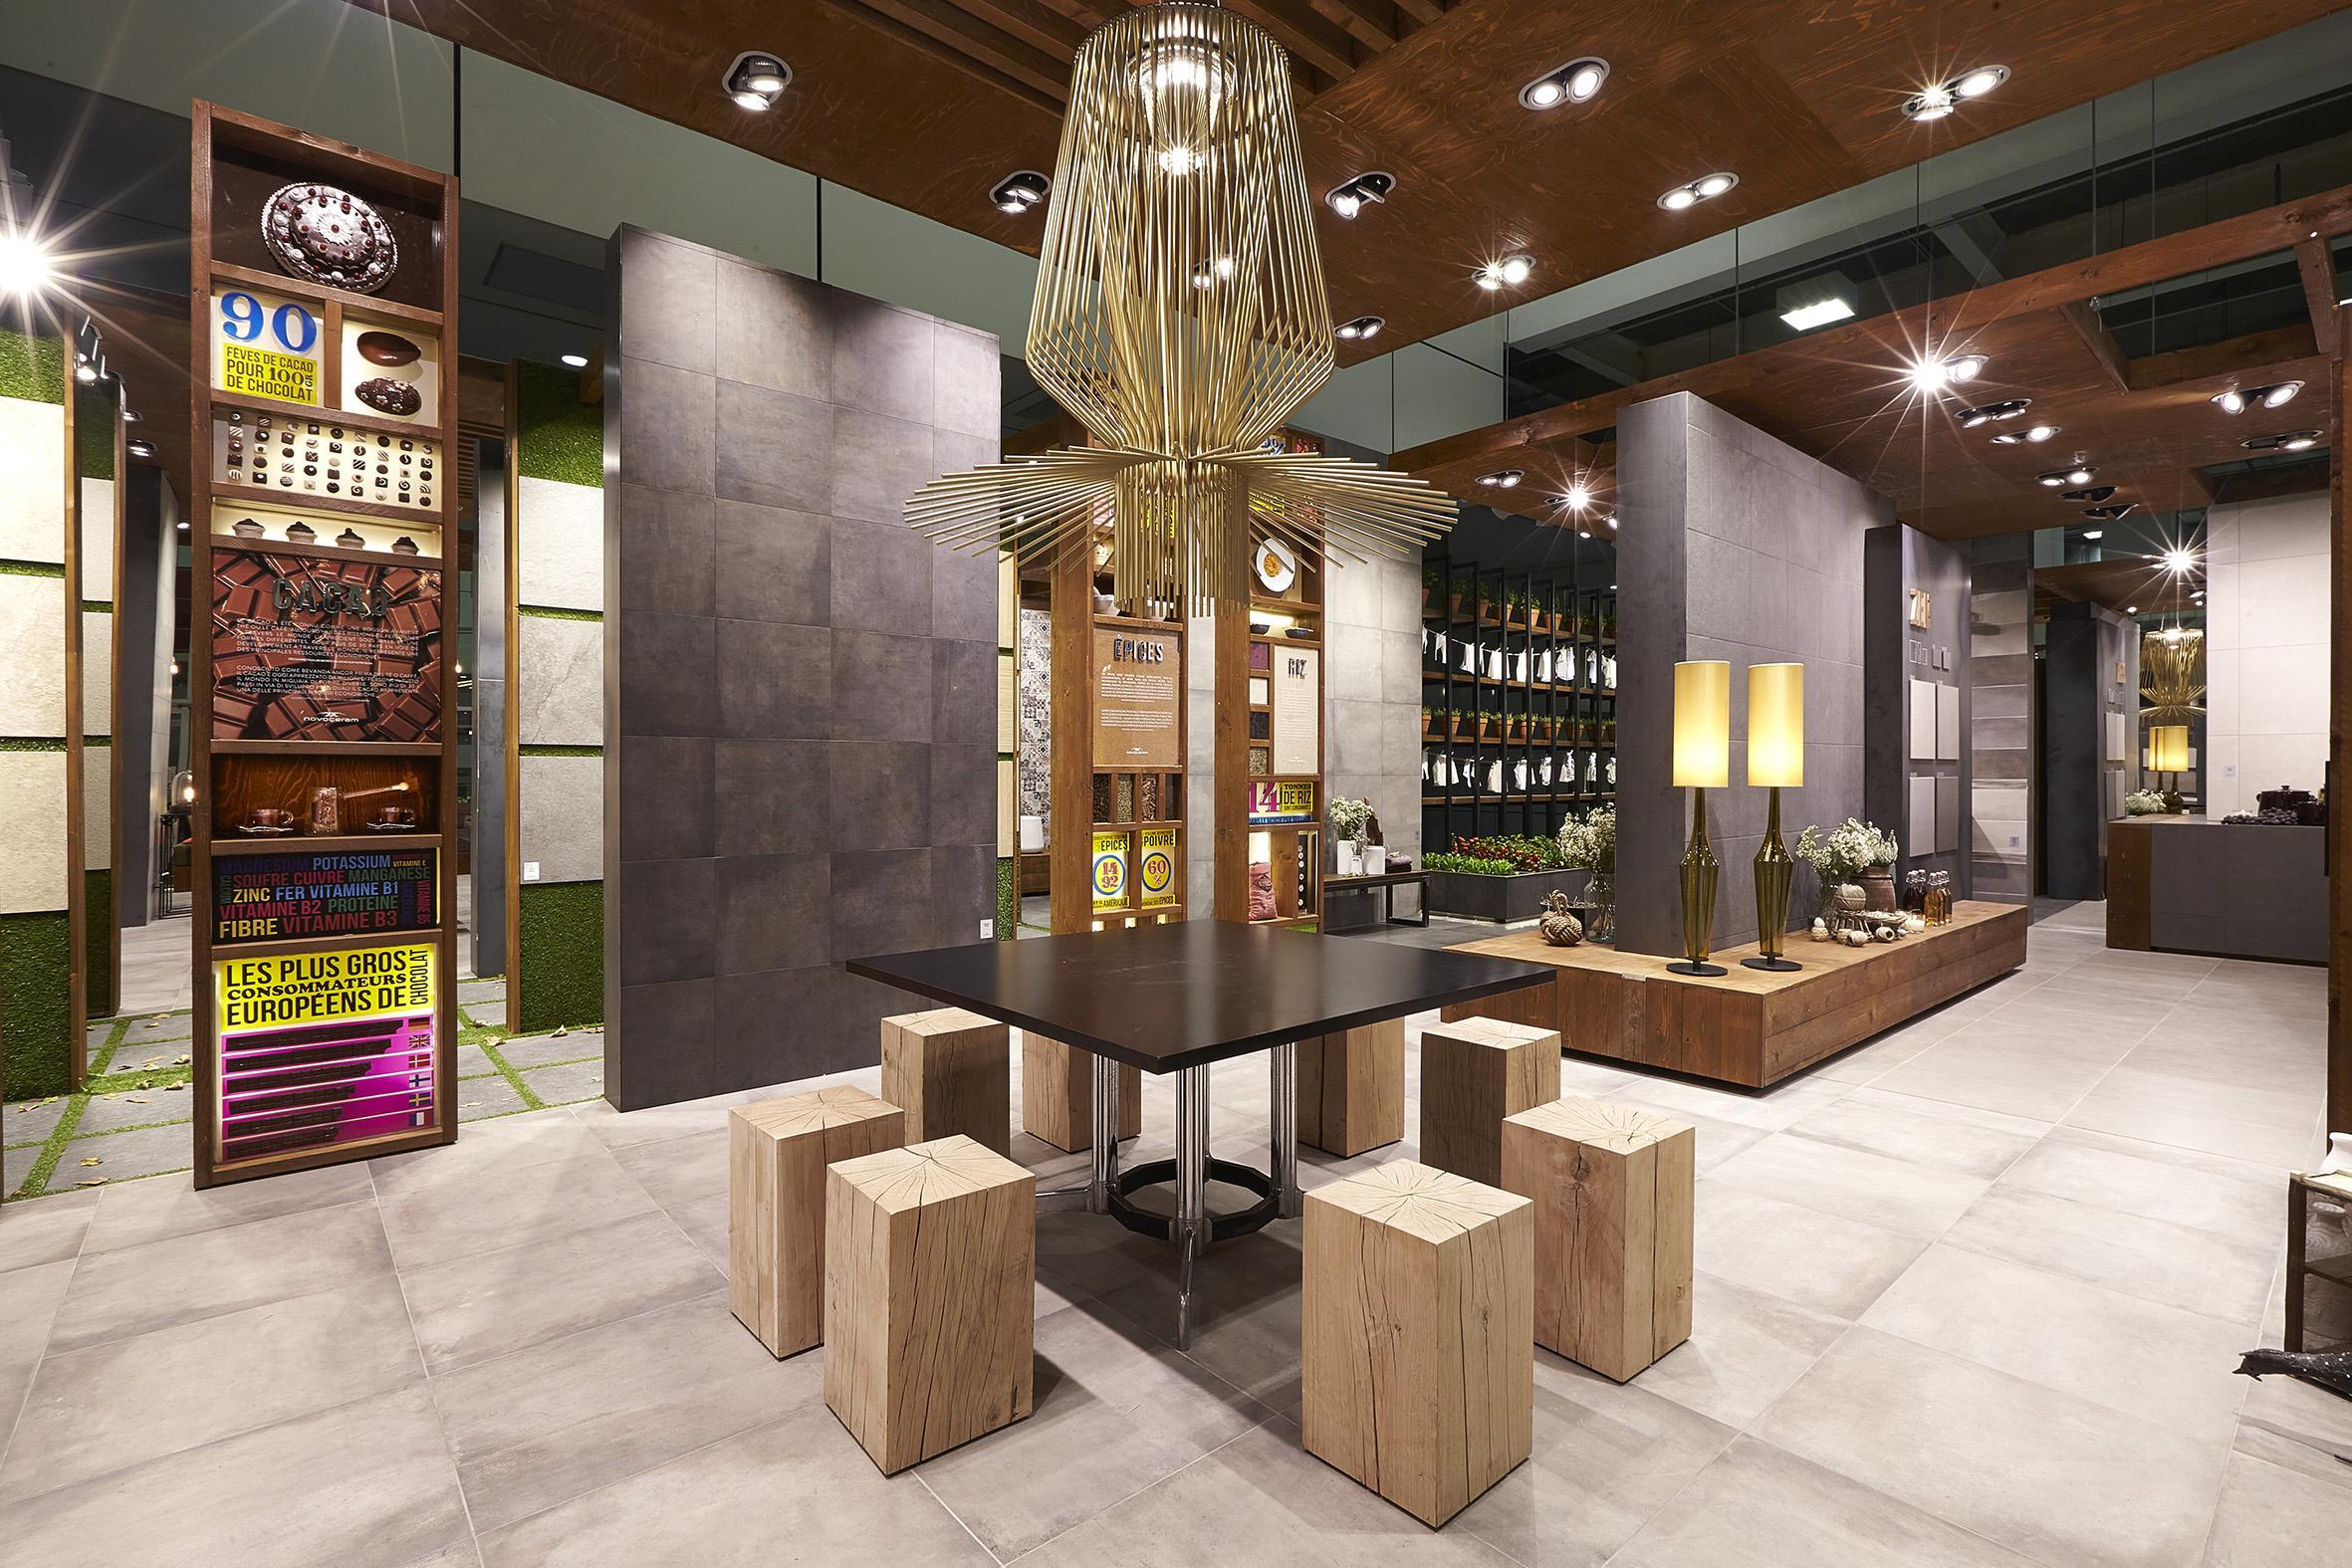 francesco-catalano-interior-design370